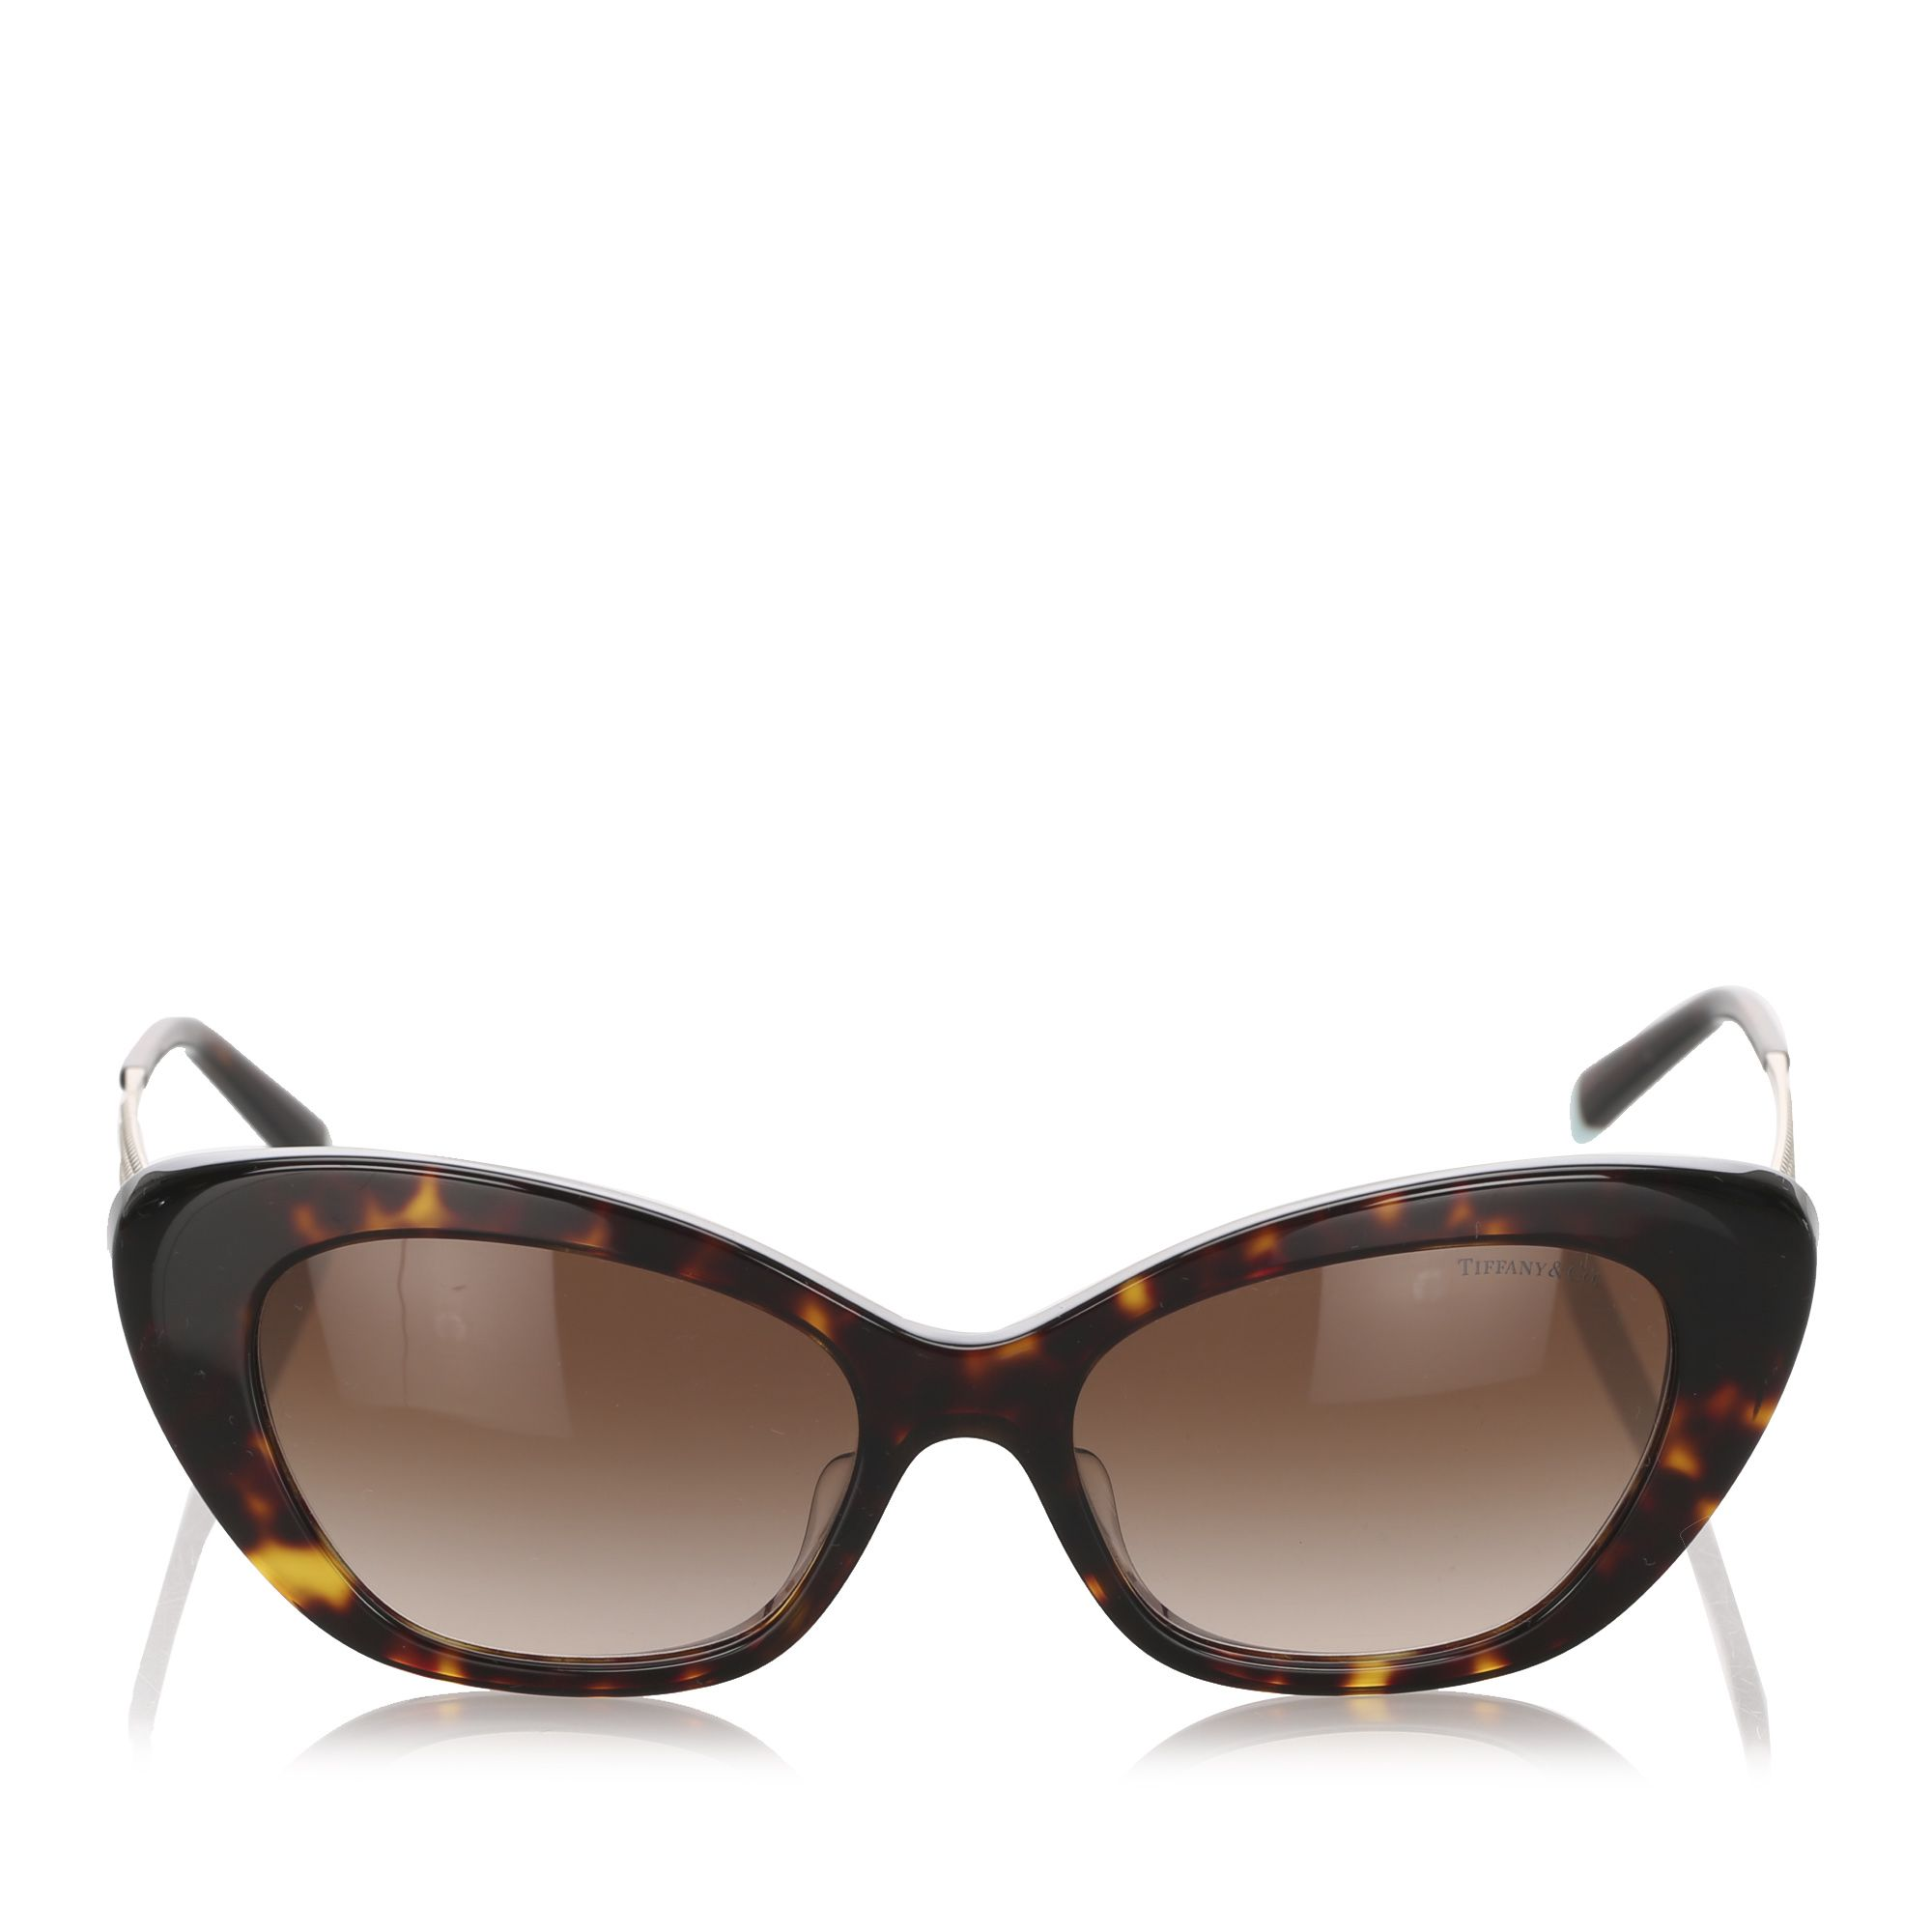 Tiffany Cat Eye Tinted Sunglasses Brown